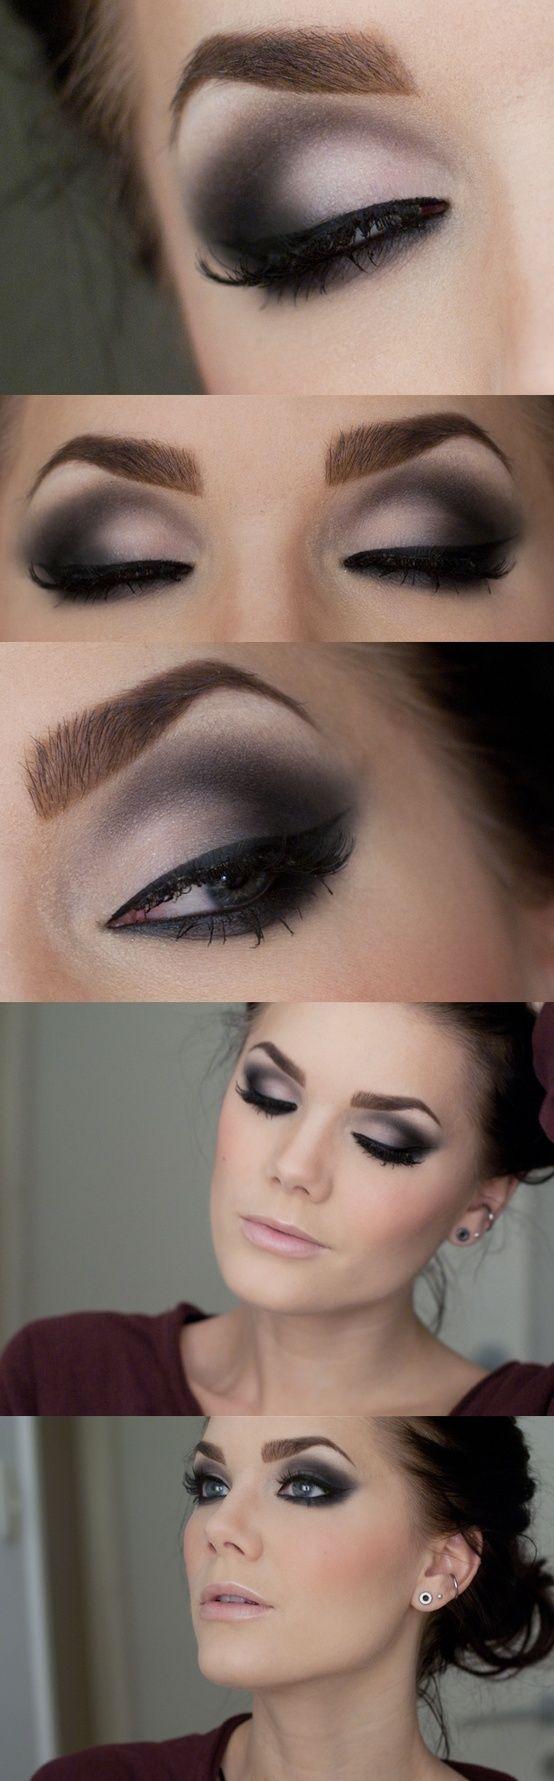 #makeup #eyes #augen #schminke